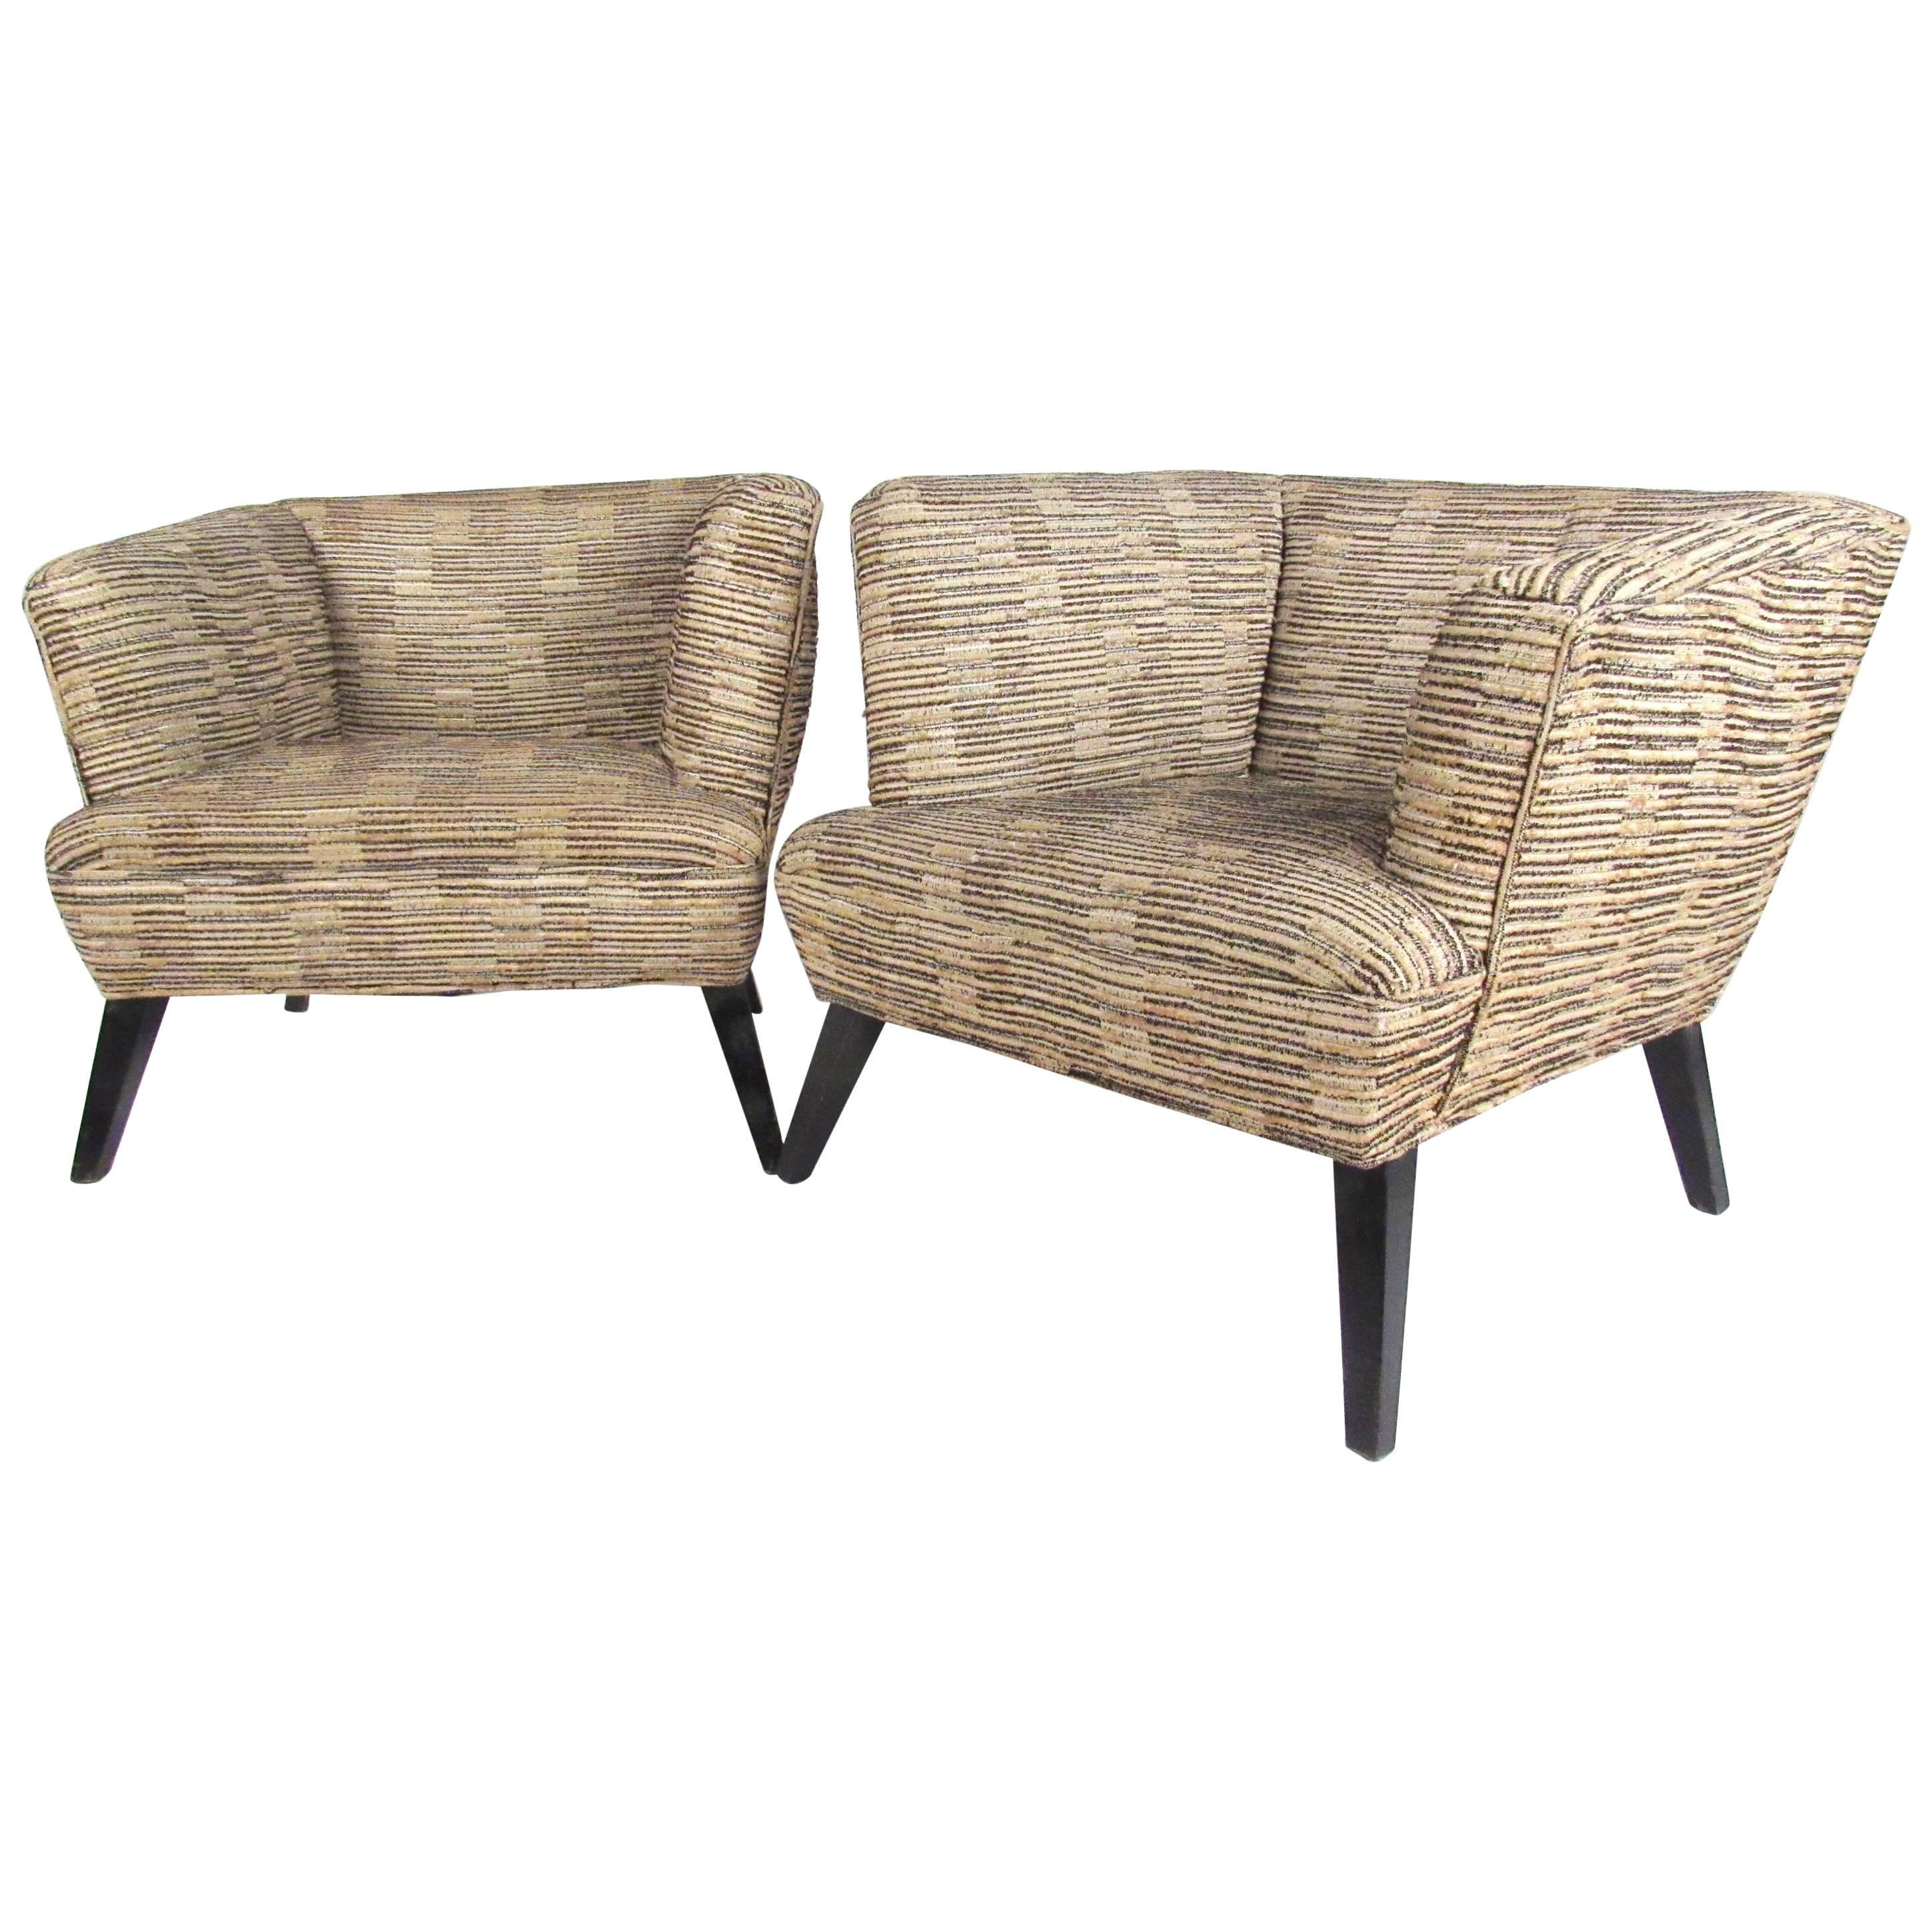 Pair of Vintage Modern Art Deco Club Chairs